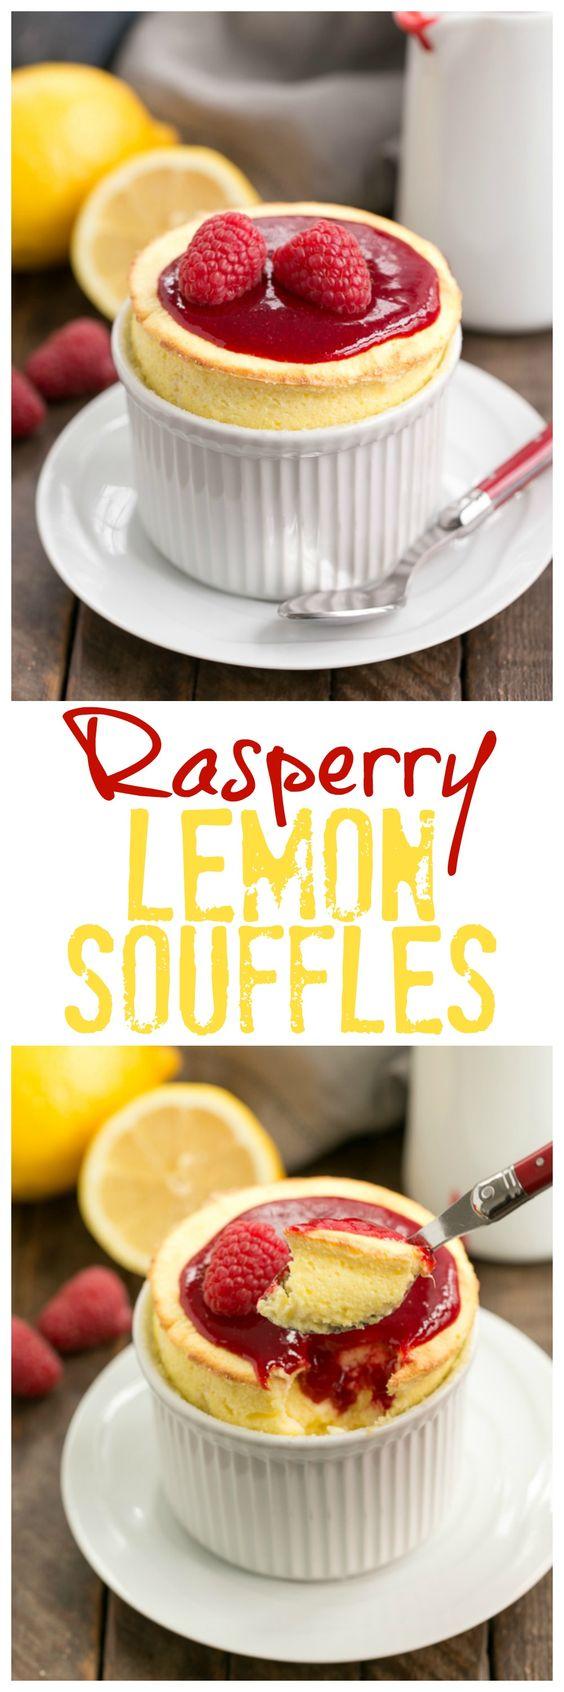 Raspberry Topped Lemon Soufflés | An exquisite citrus dessert @lizzydo